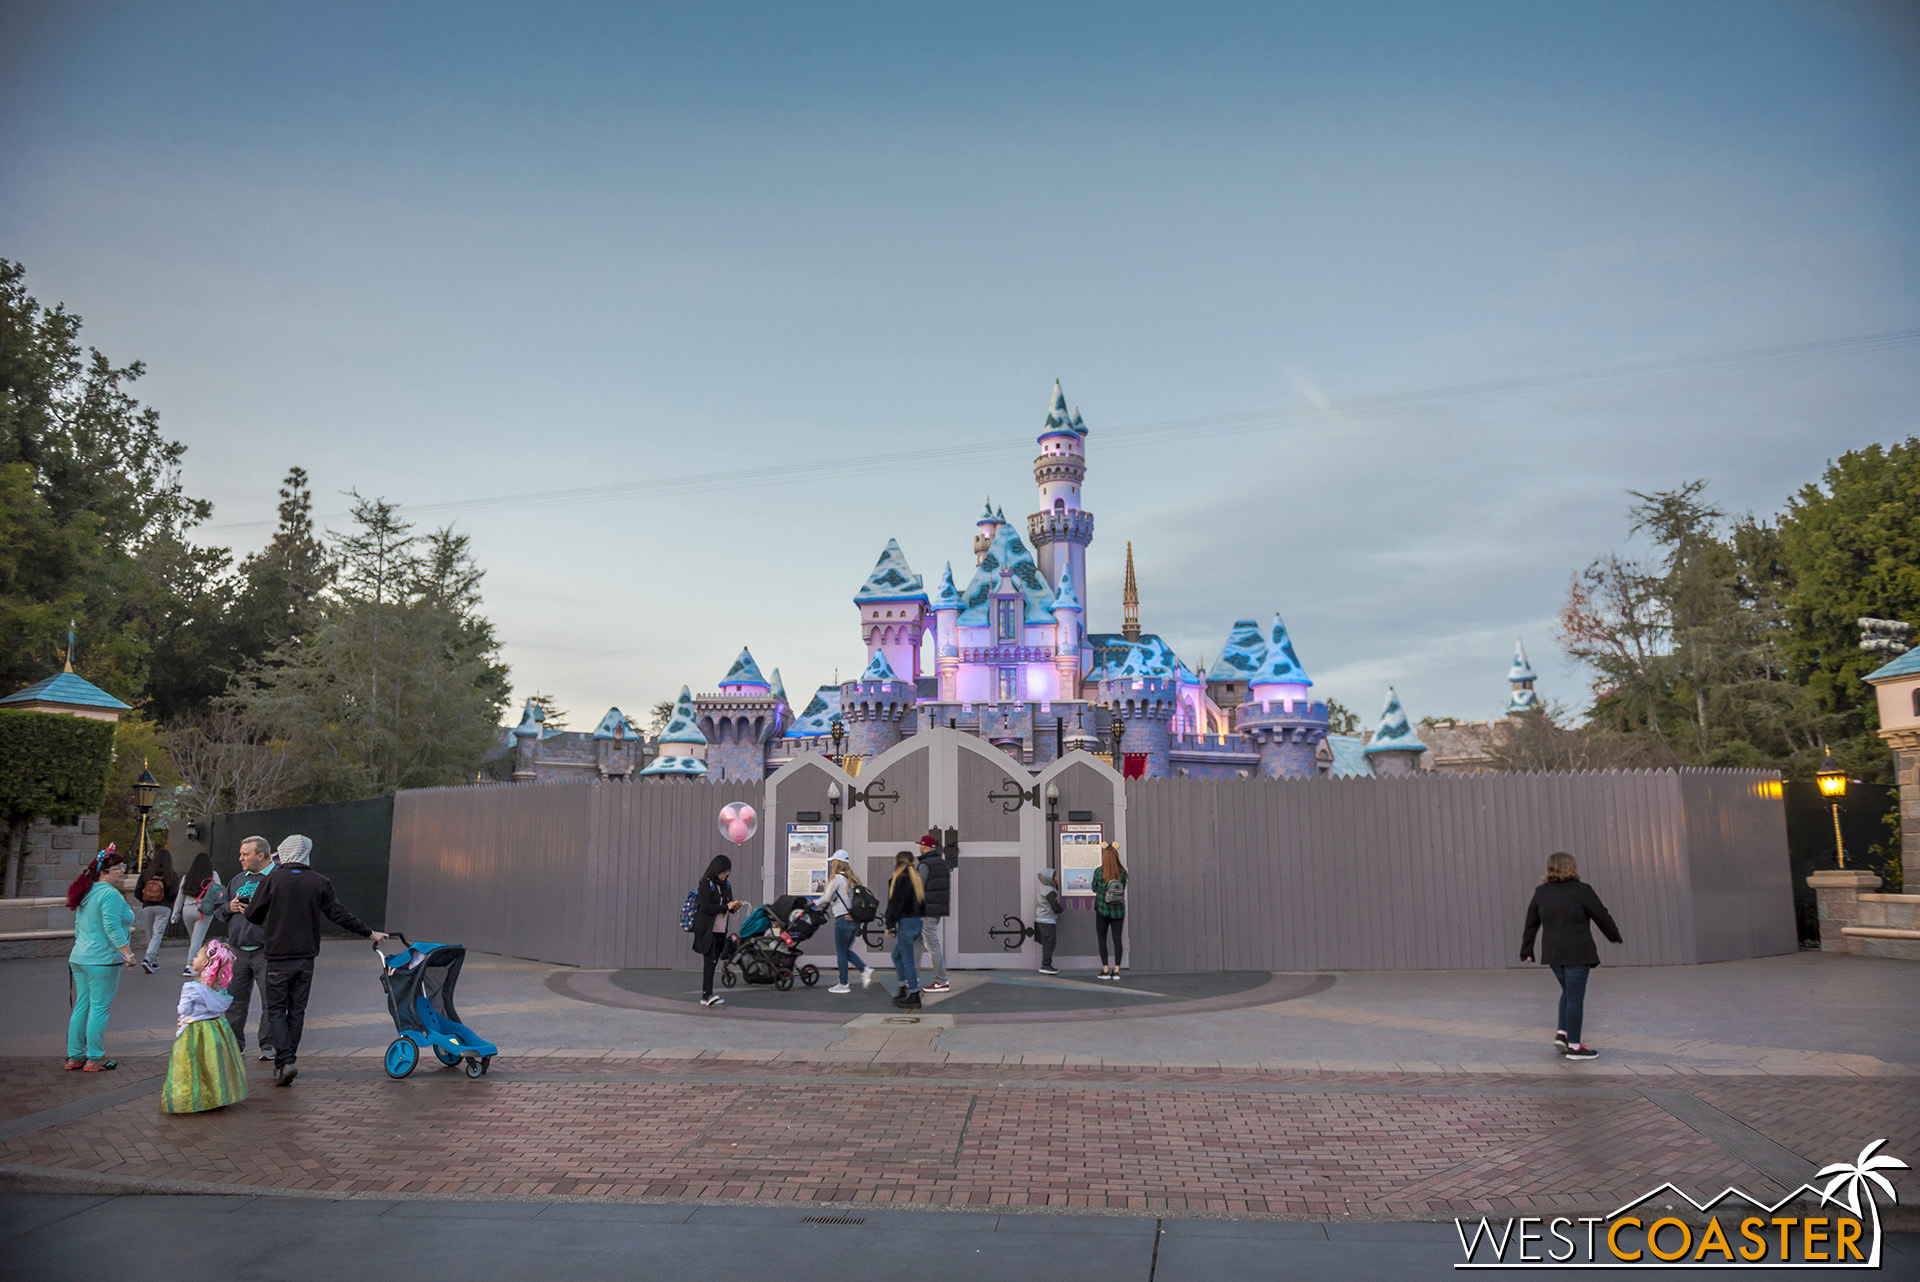 Sleeping Beauty Castle is also under refurbishment.